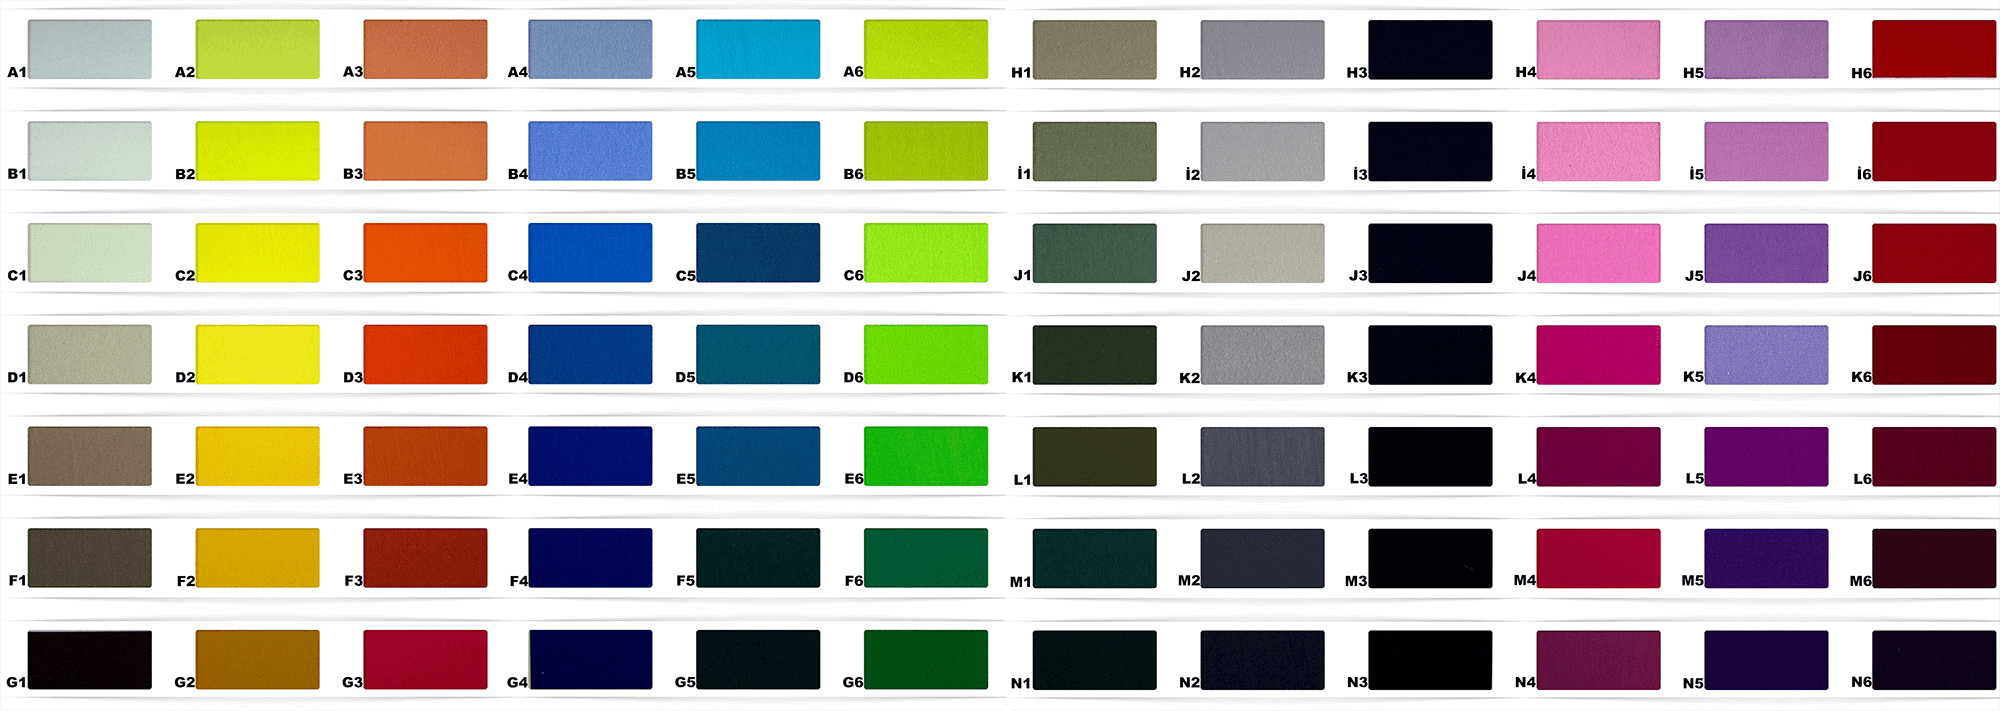 pantone fabric colors